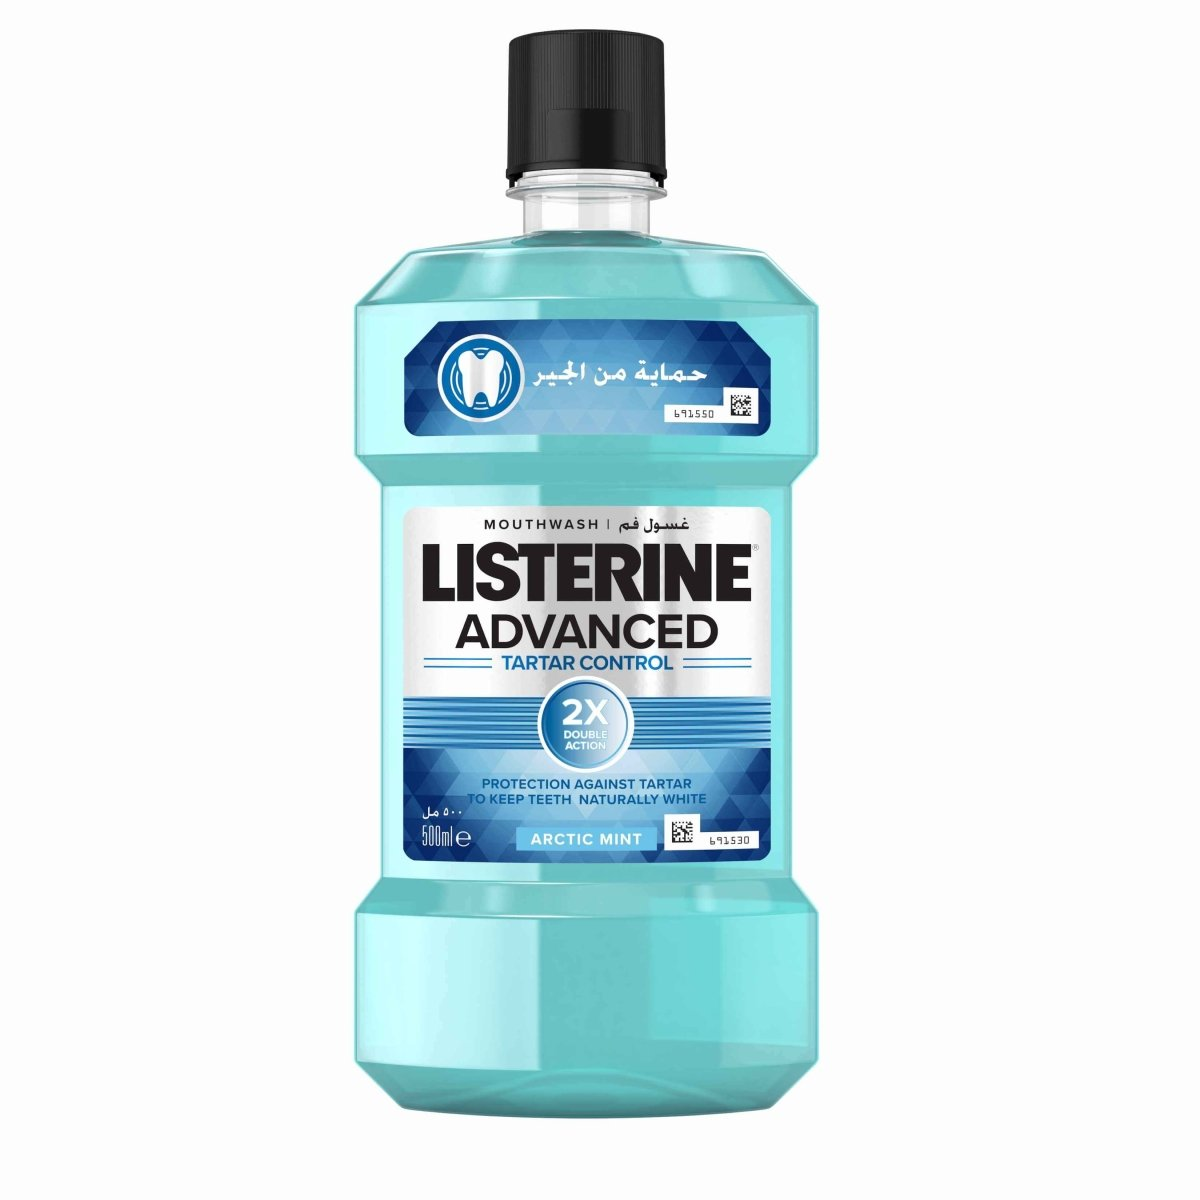 listerine advanced tartar control teeth whitening 250